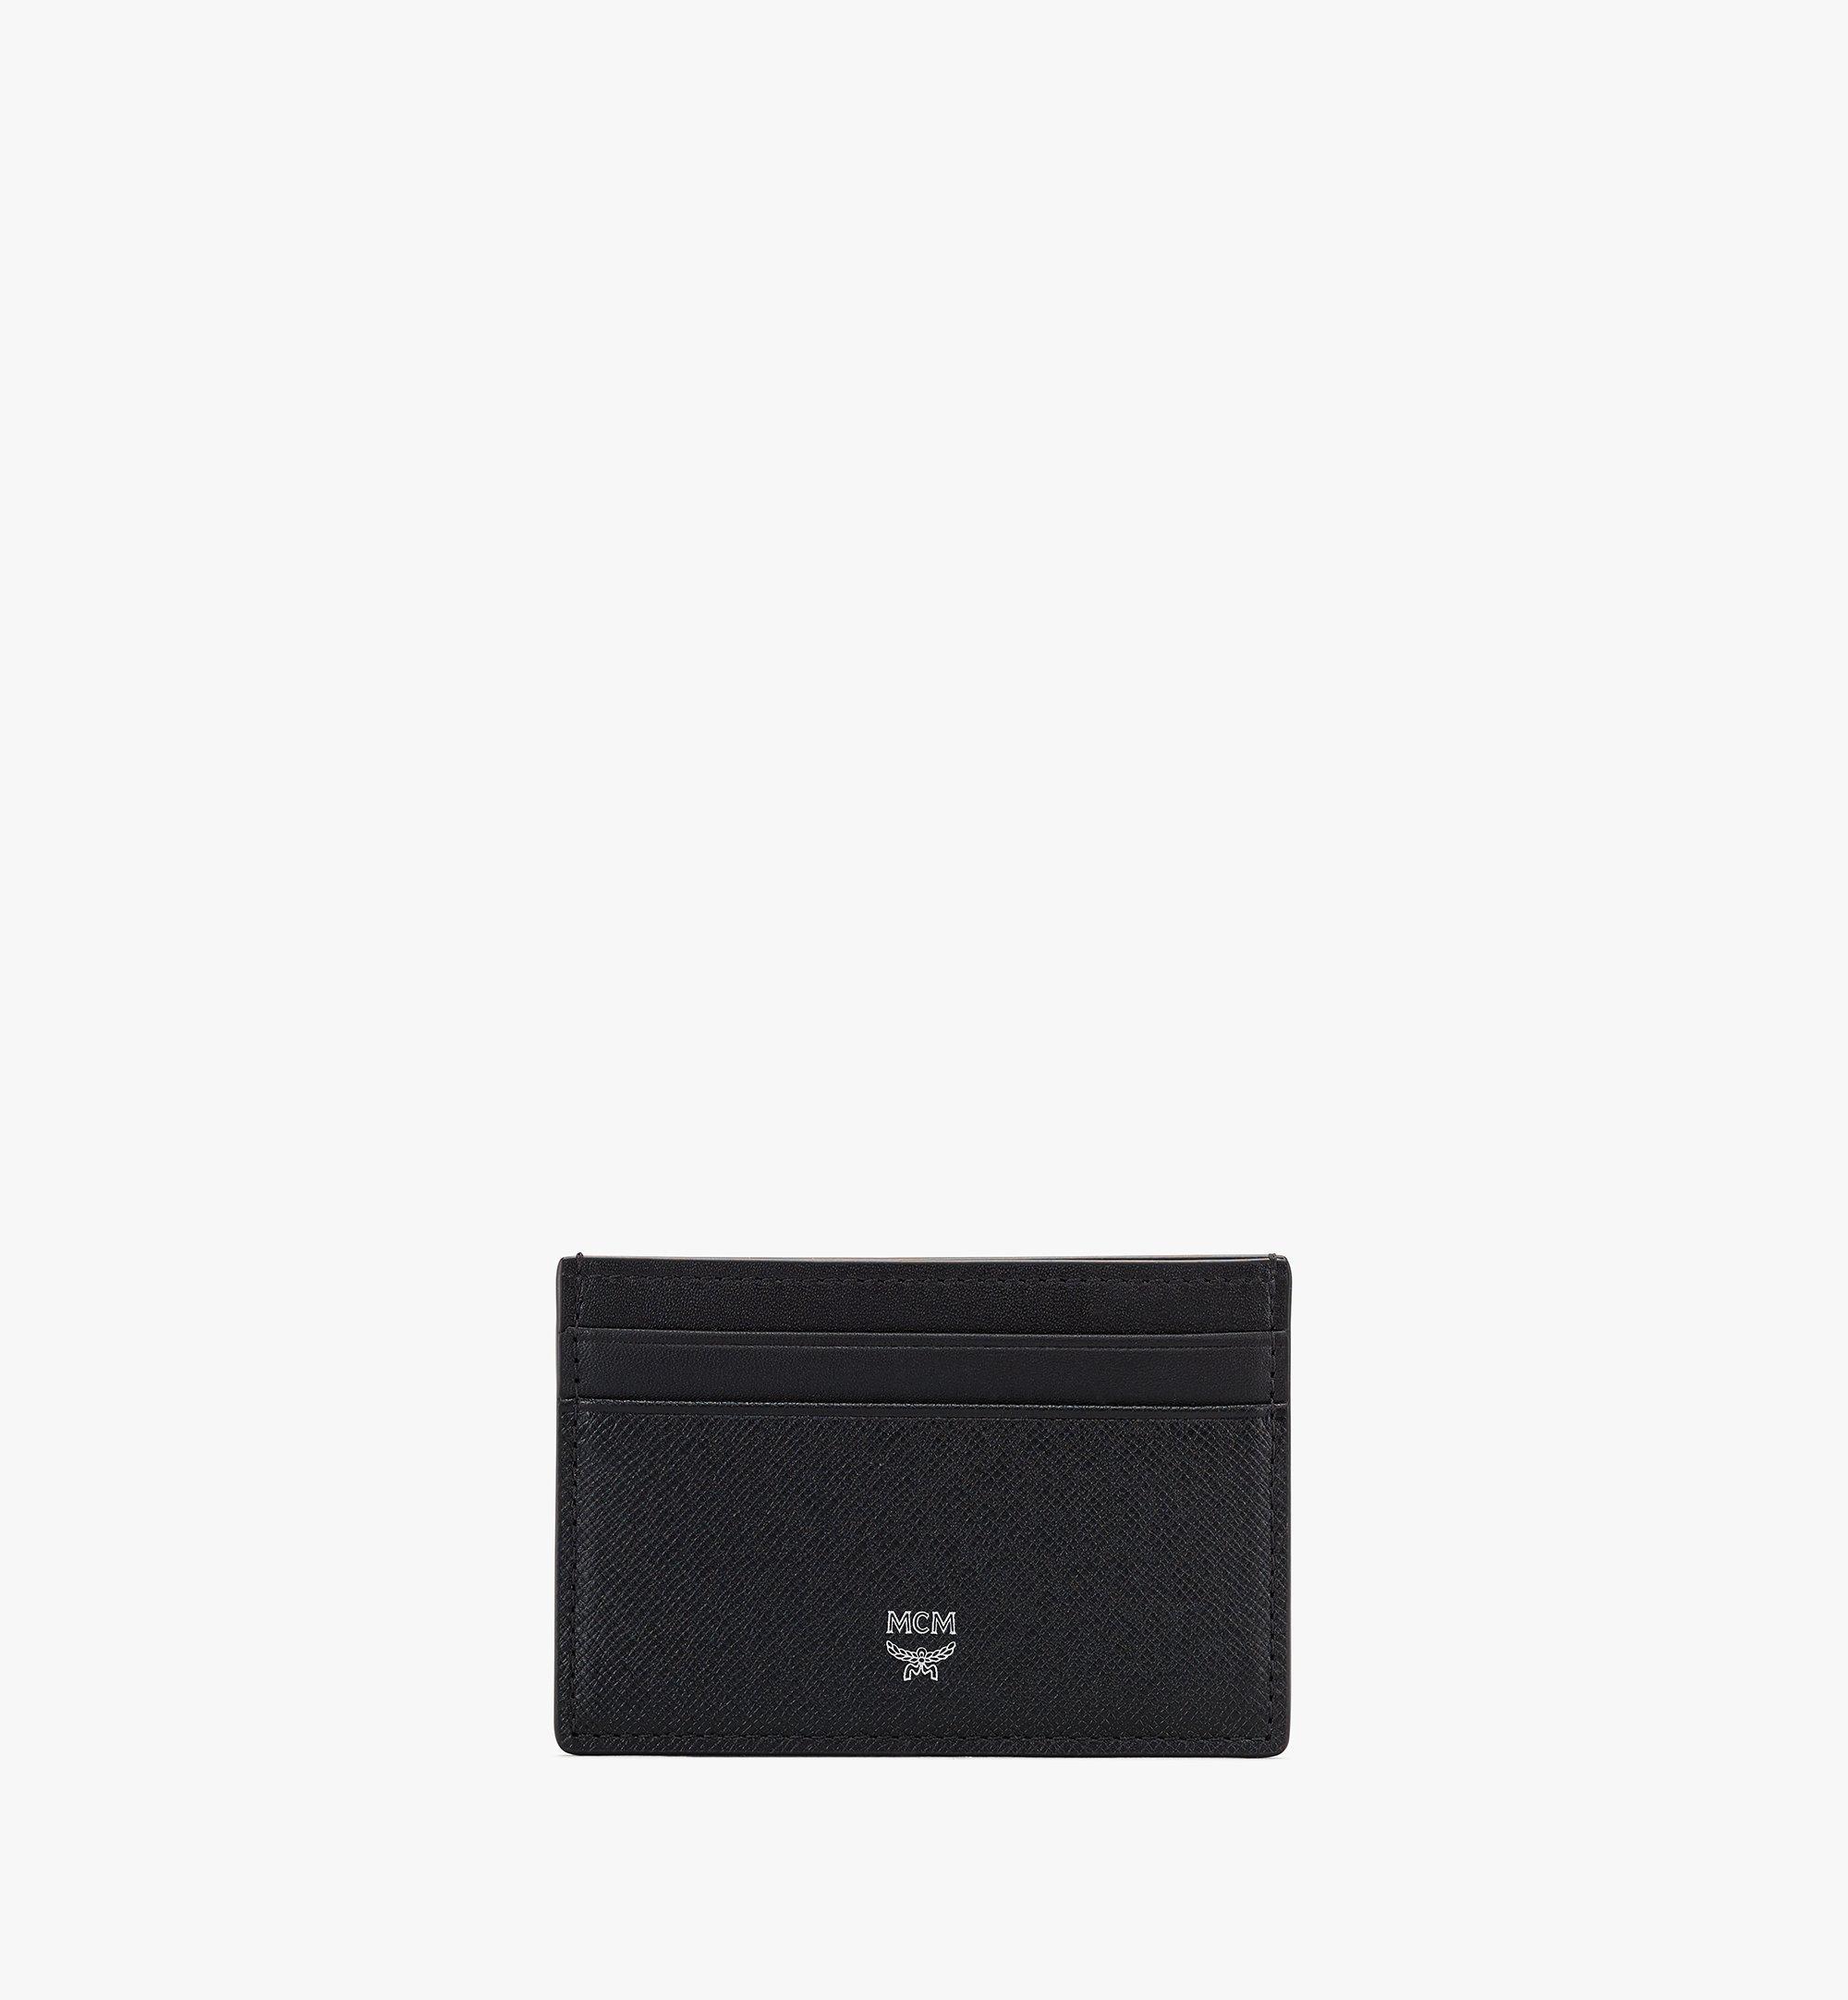 MCM New Bric Card Case Black MXAASLL04BK001 Alternate View 1